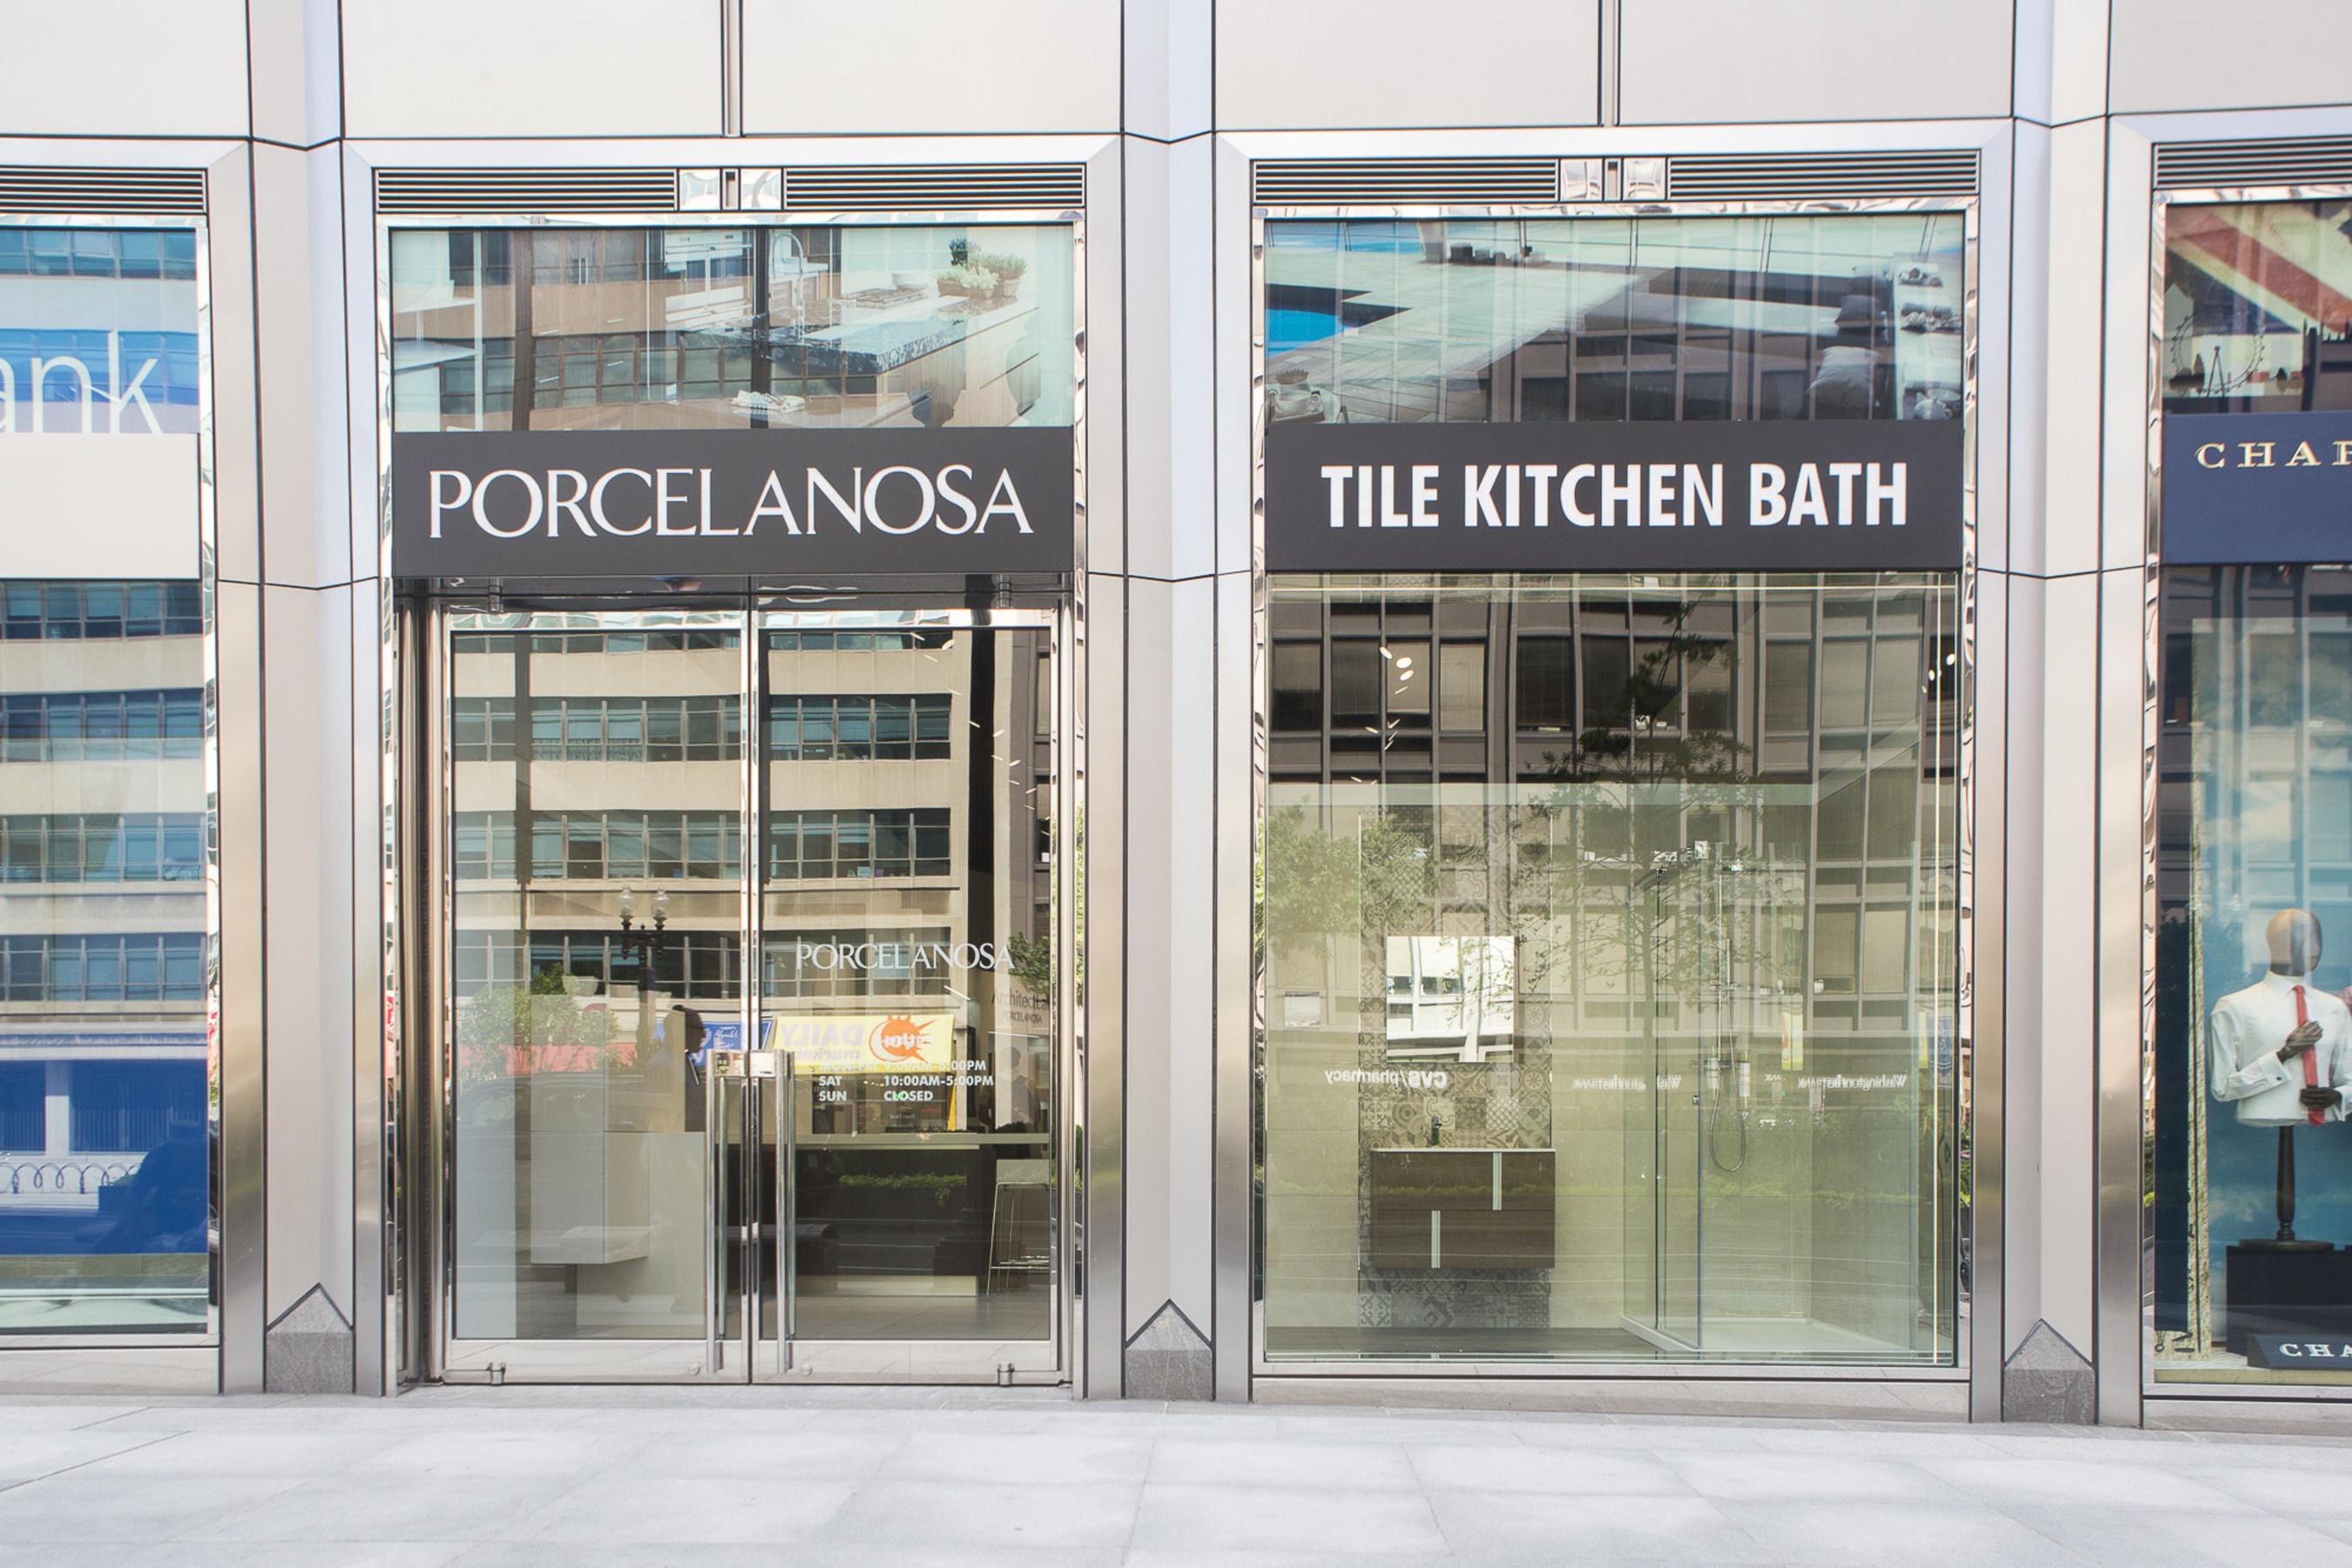 Porcelanosa opens new tile kitchen bath showroom in - Bathroom showroom cleveland ohio ...